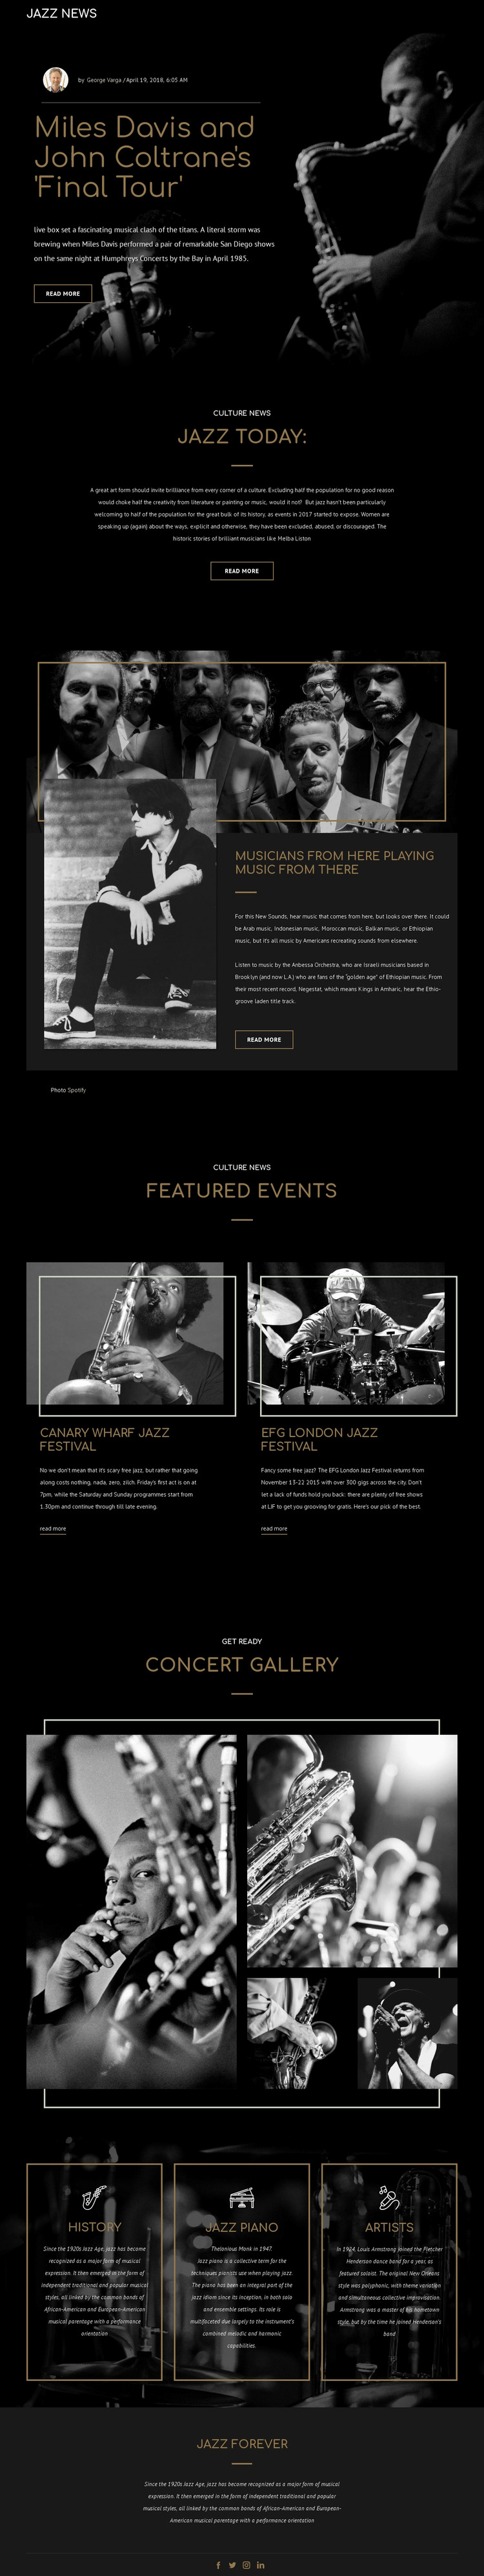 Legengs of jazz music Website Maker